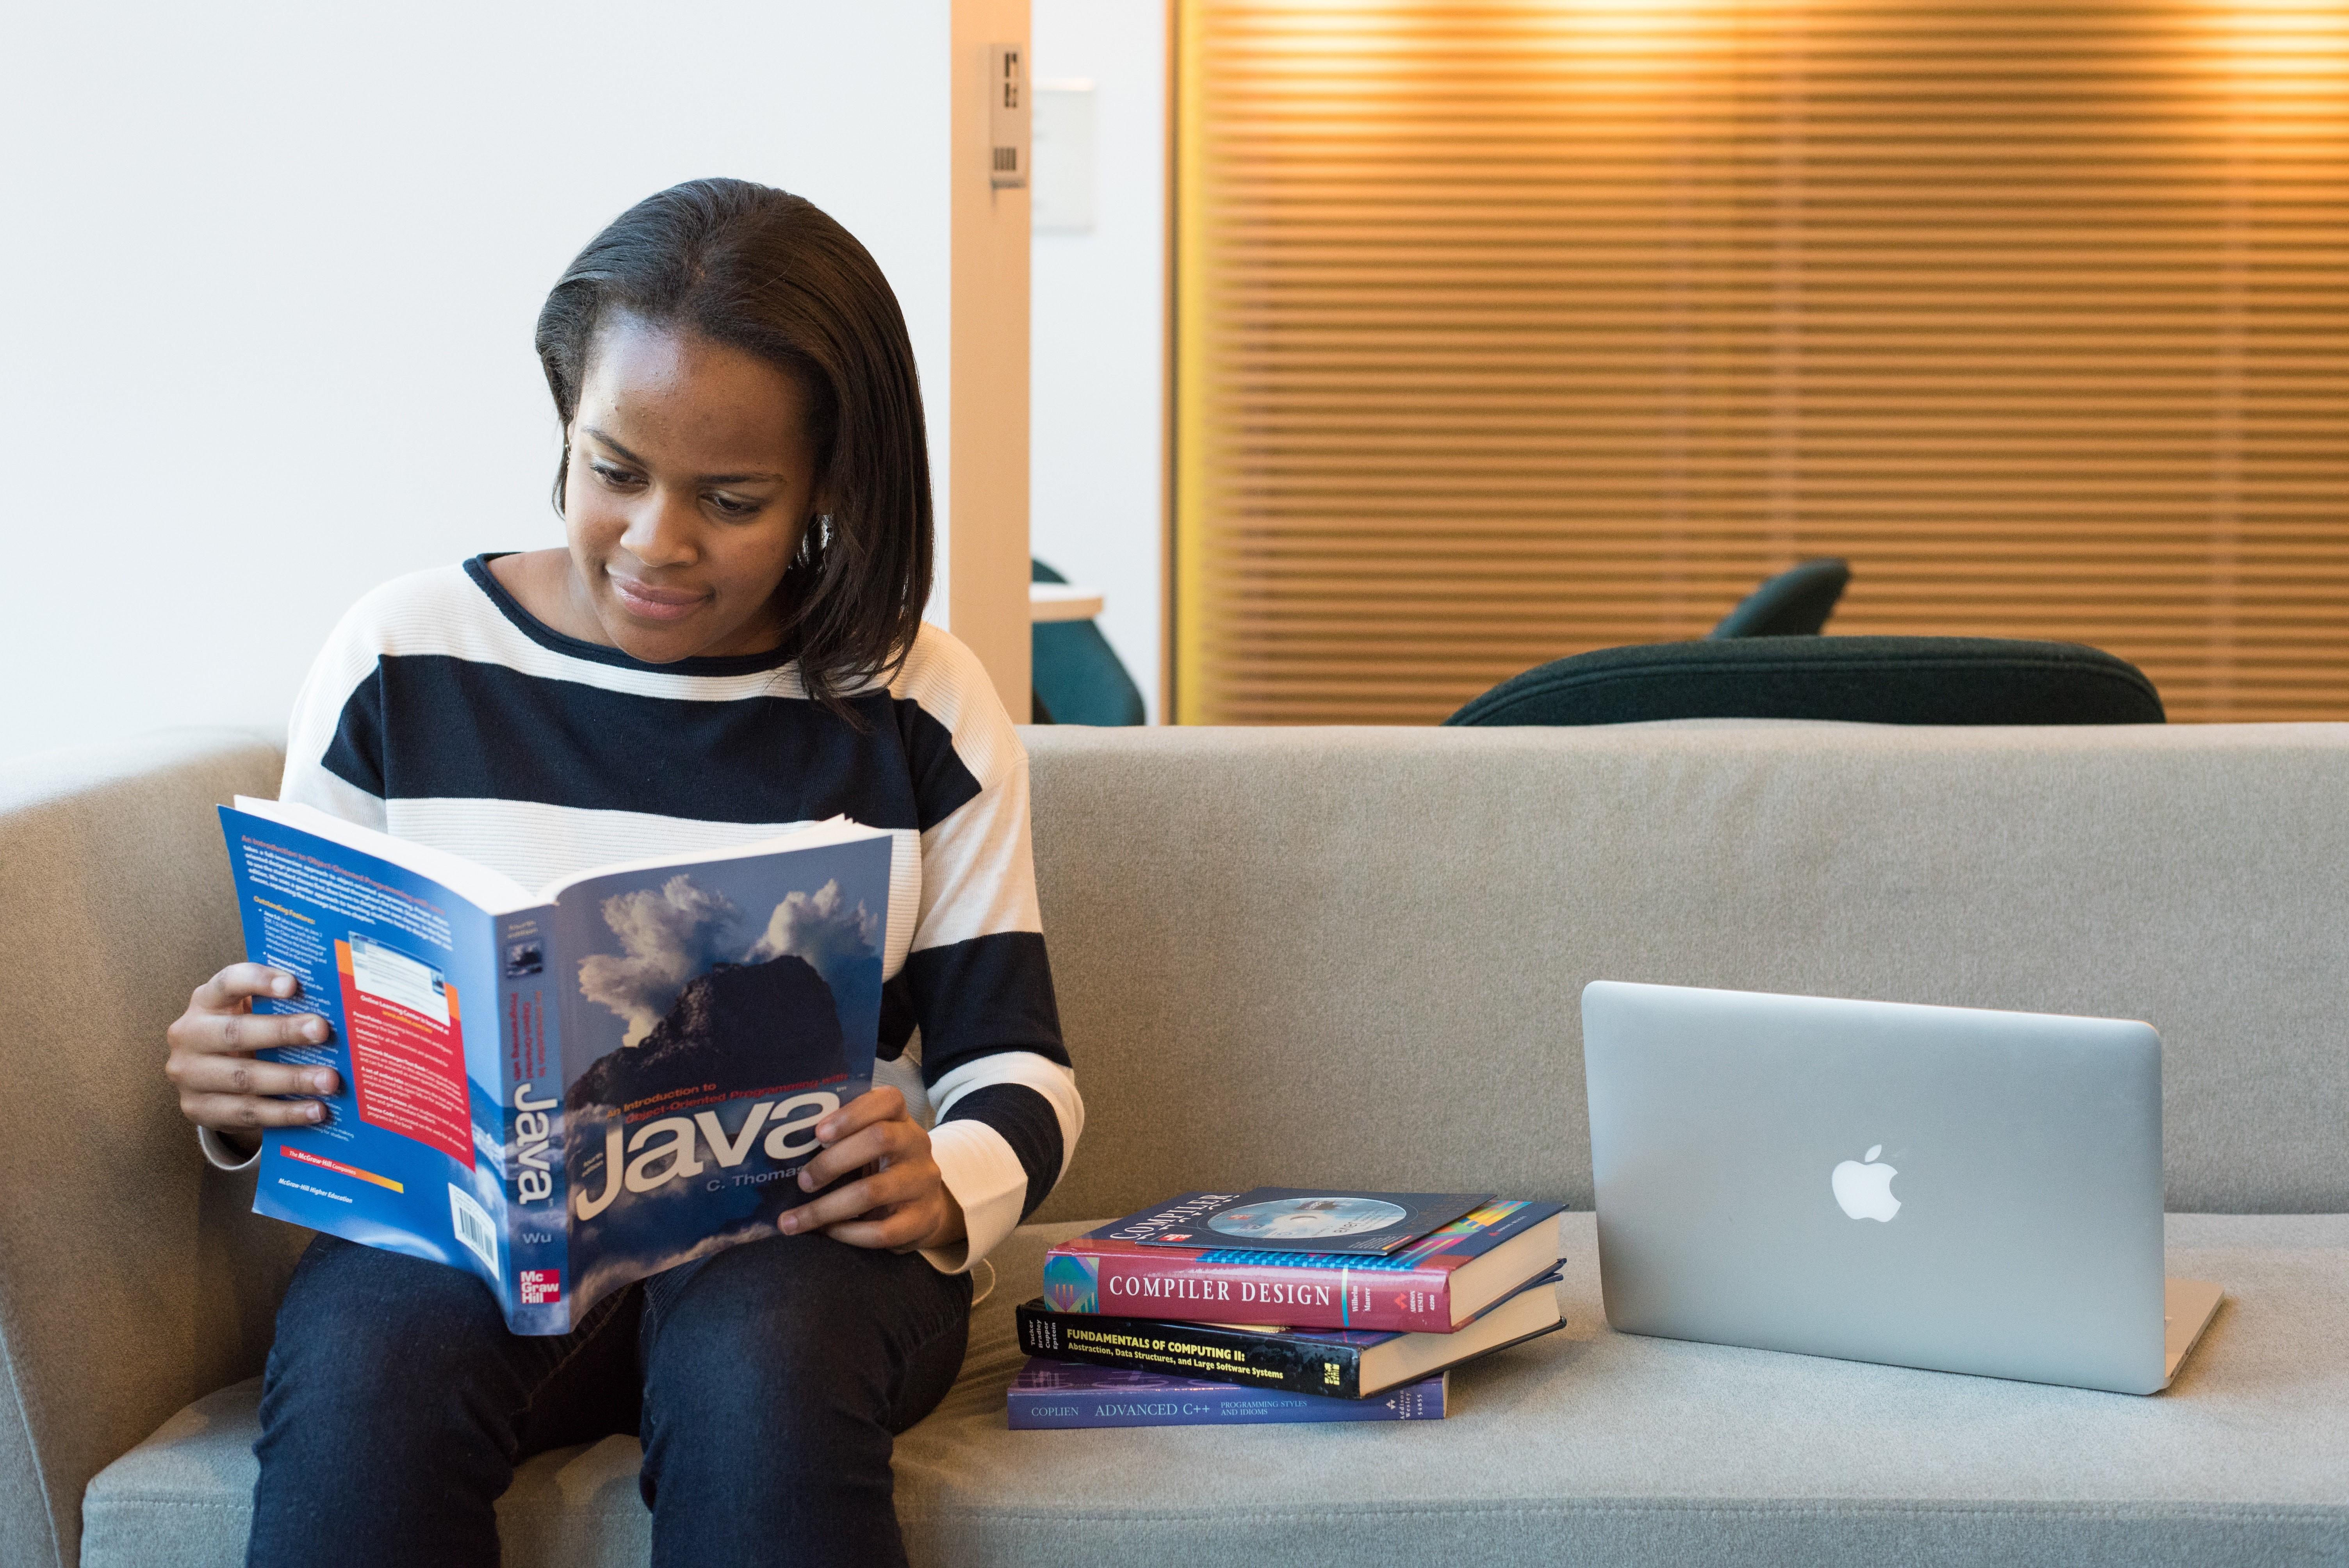 Garota estudando Java. (Foto: Christina Morillo from Pexels)